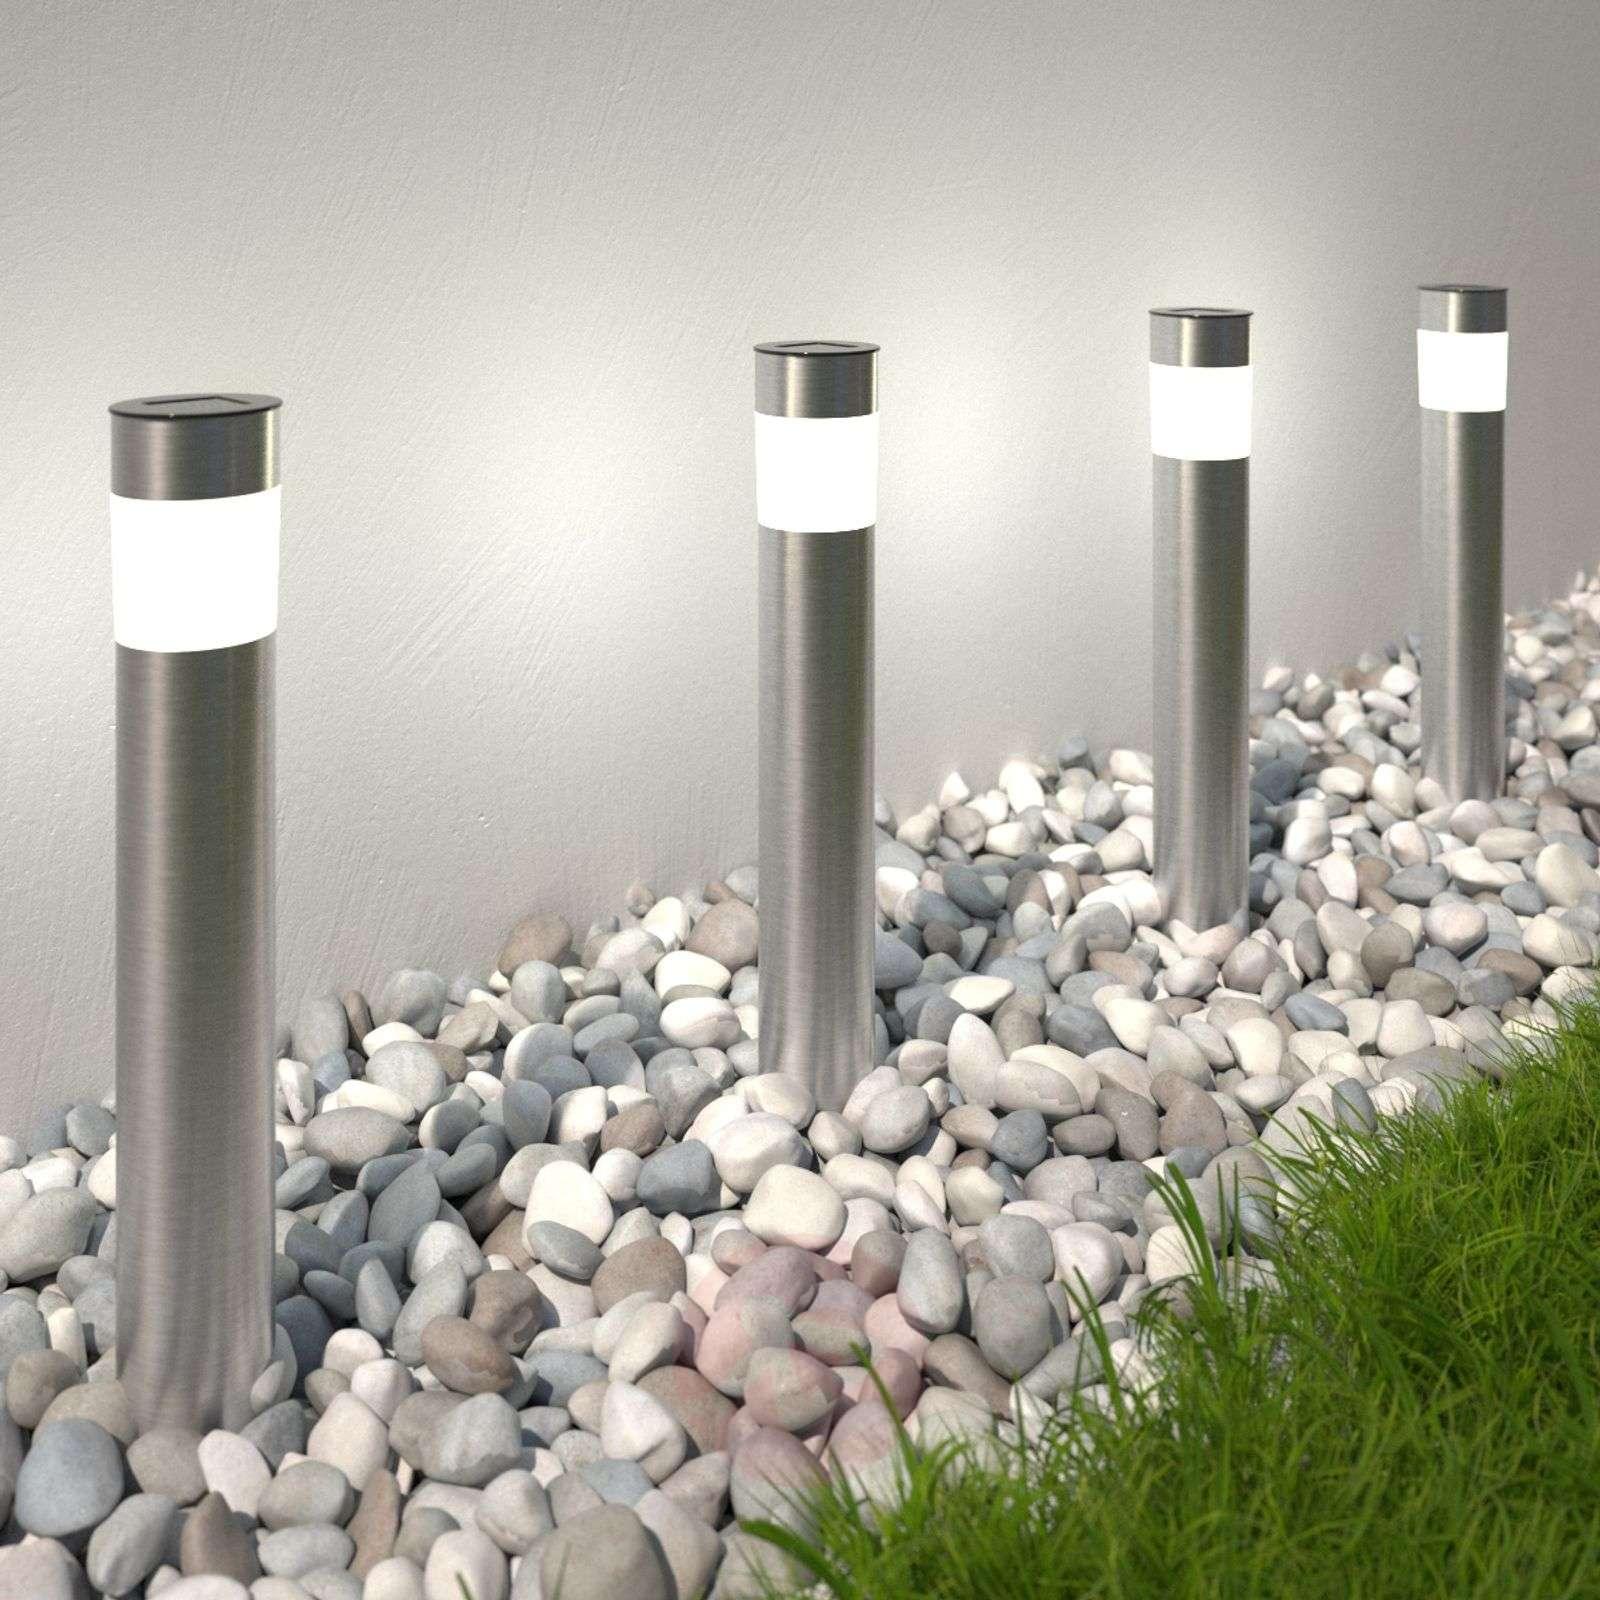 Solar-powered LED pillar light Reija in a set of 4-4014995-01